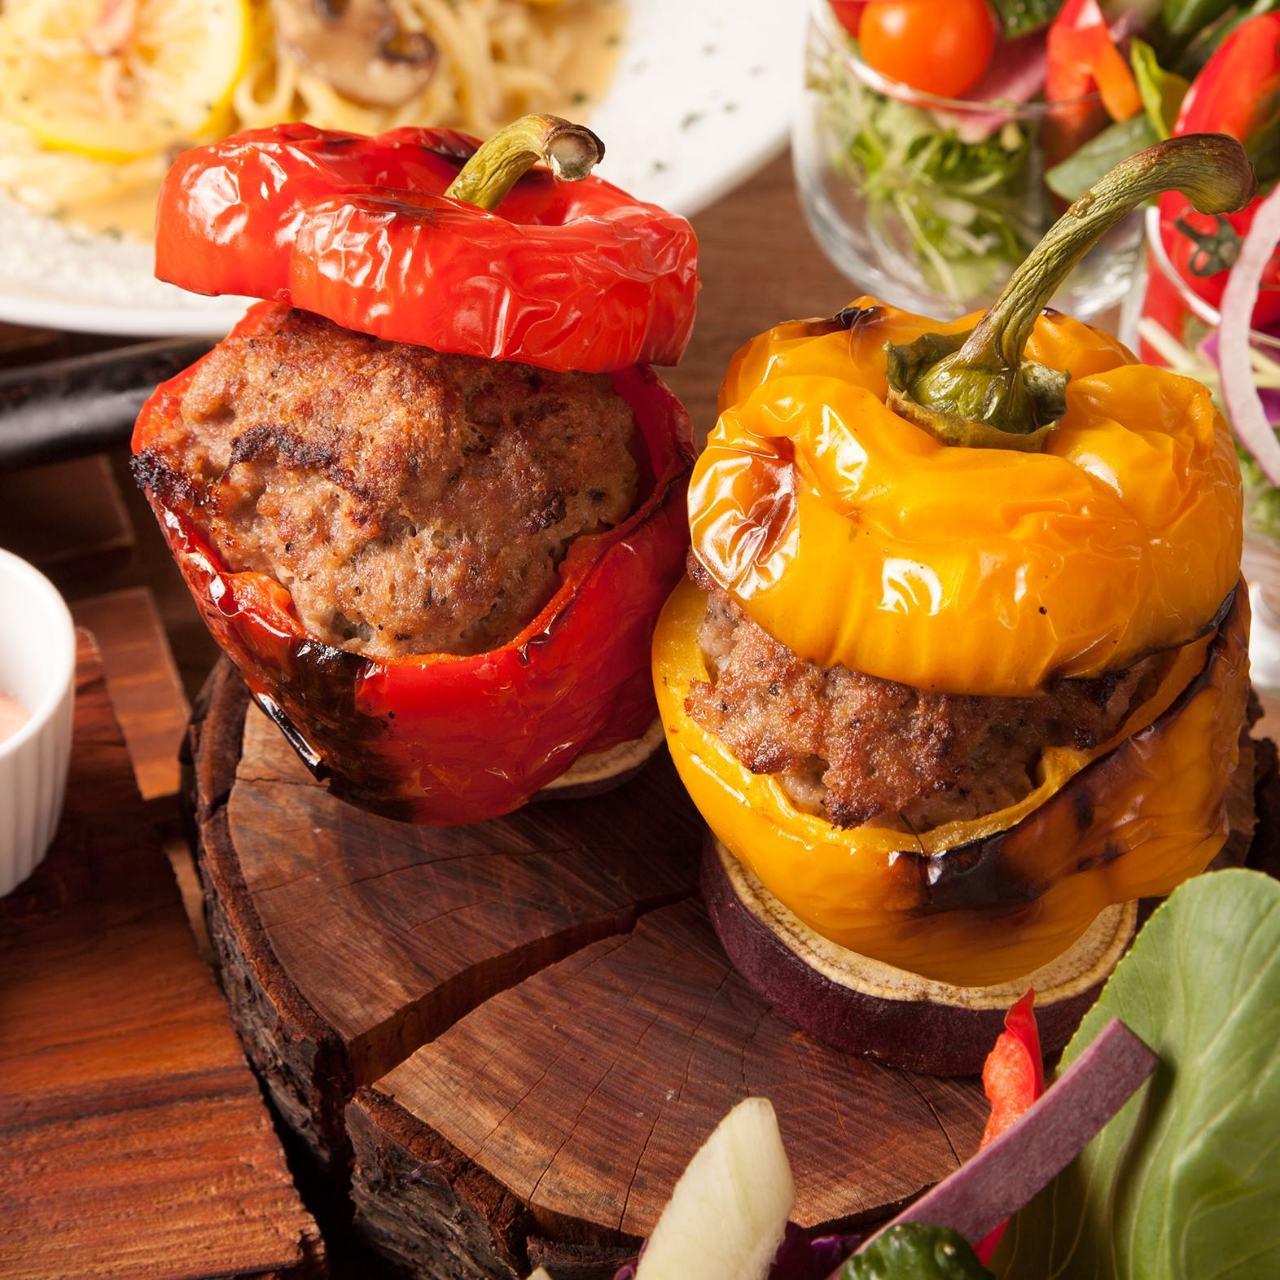 s 0n7r - 野菜パワーてんこ盛り!野菜の王様のディナー体験